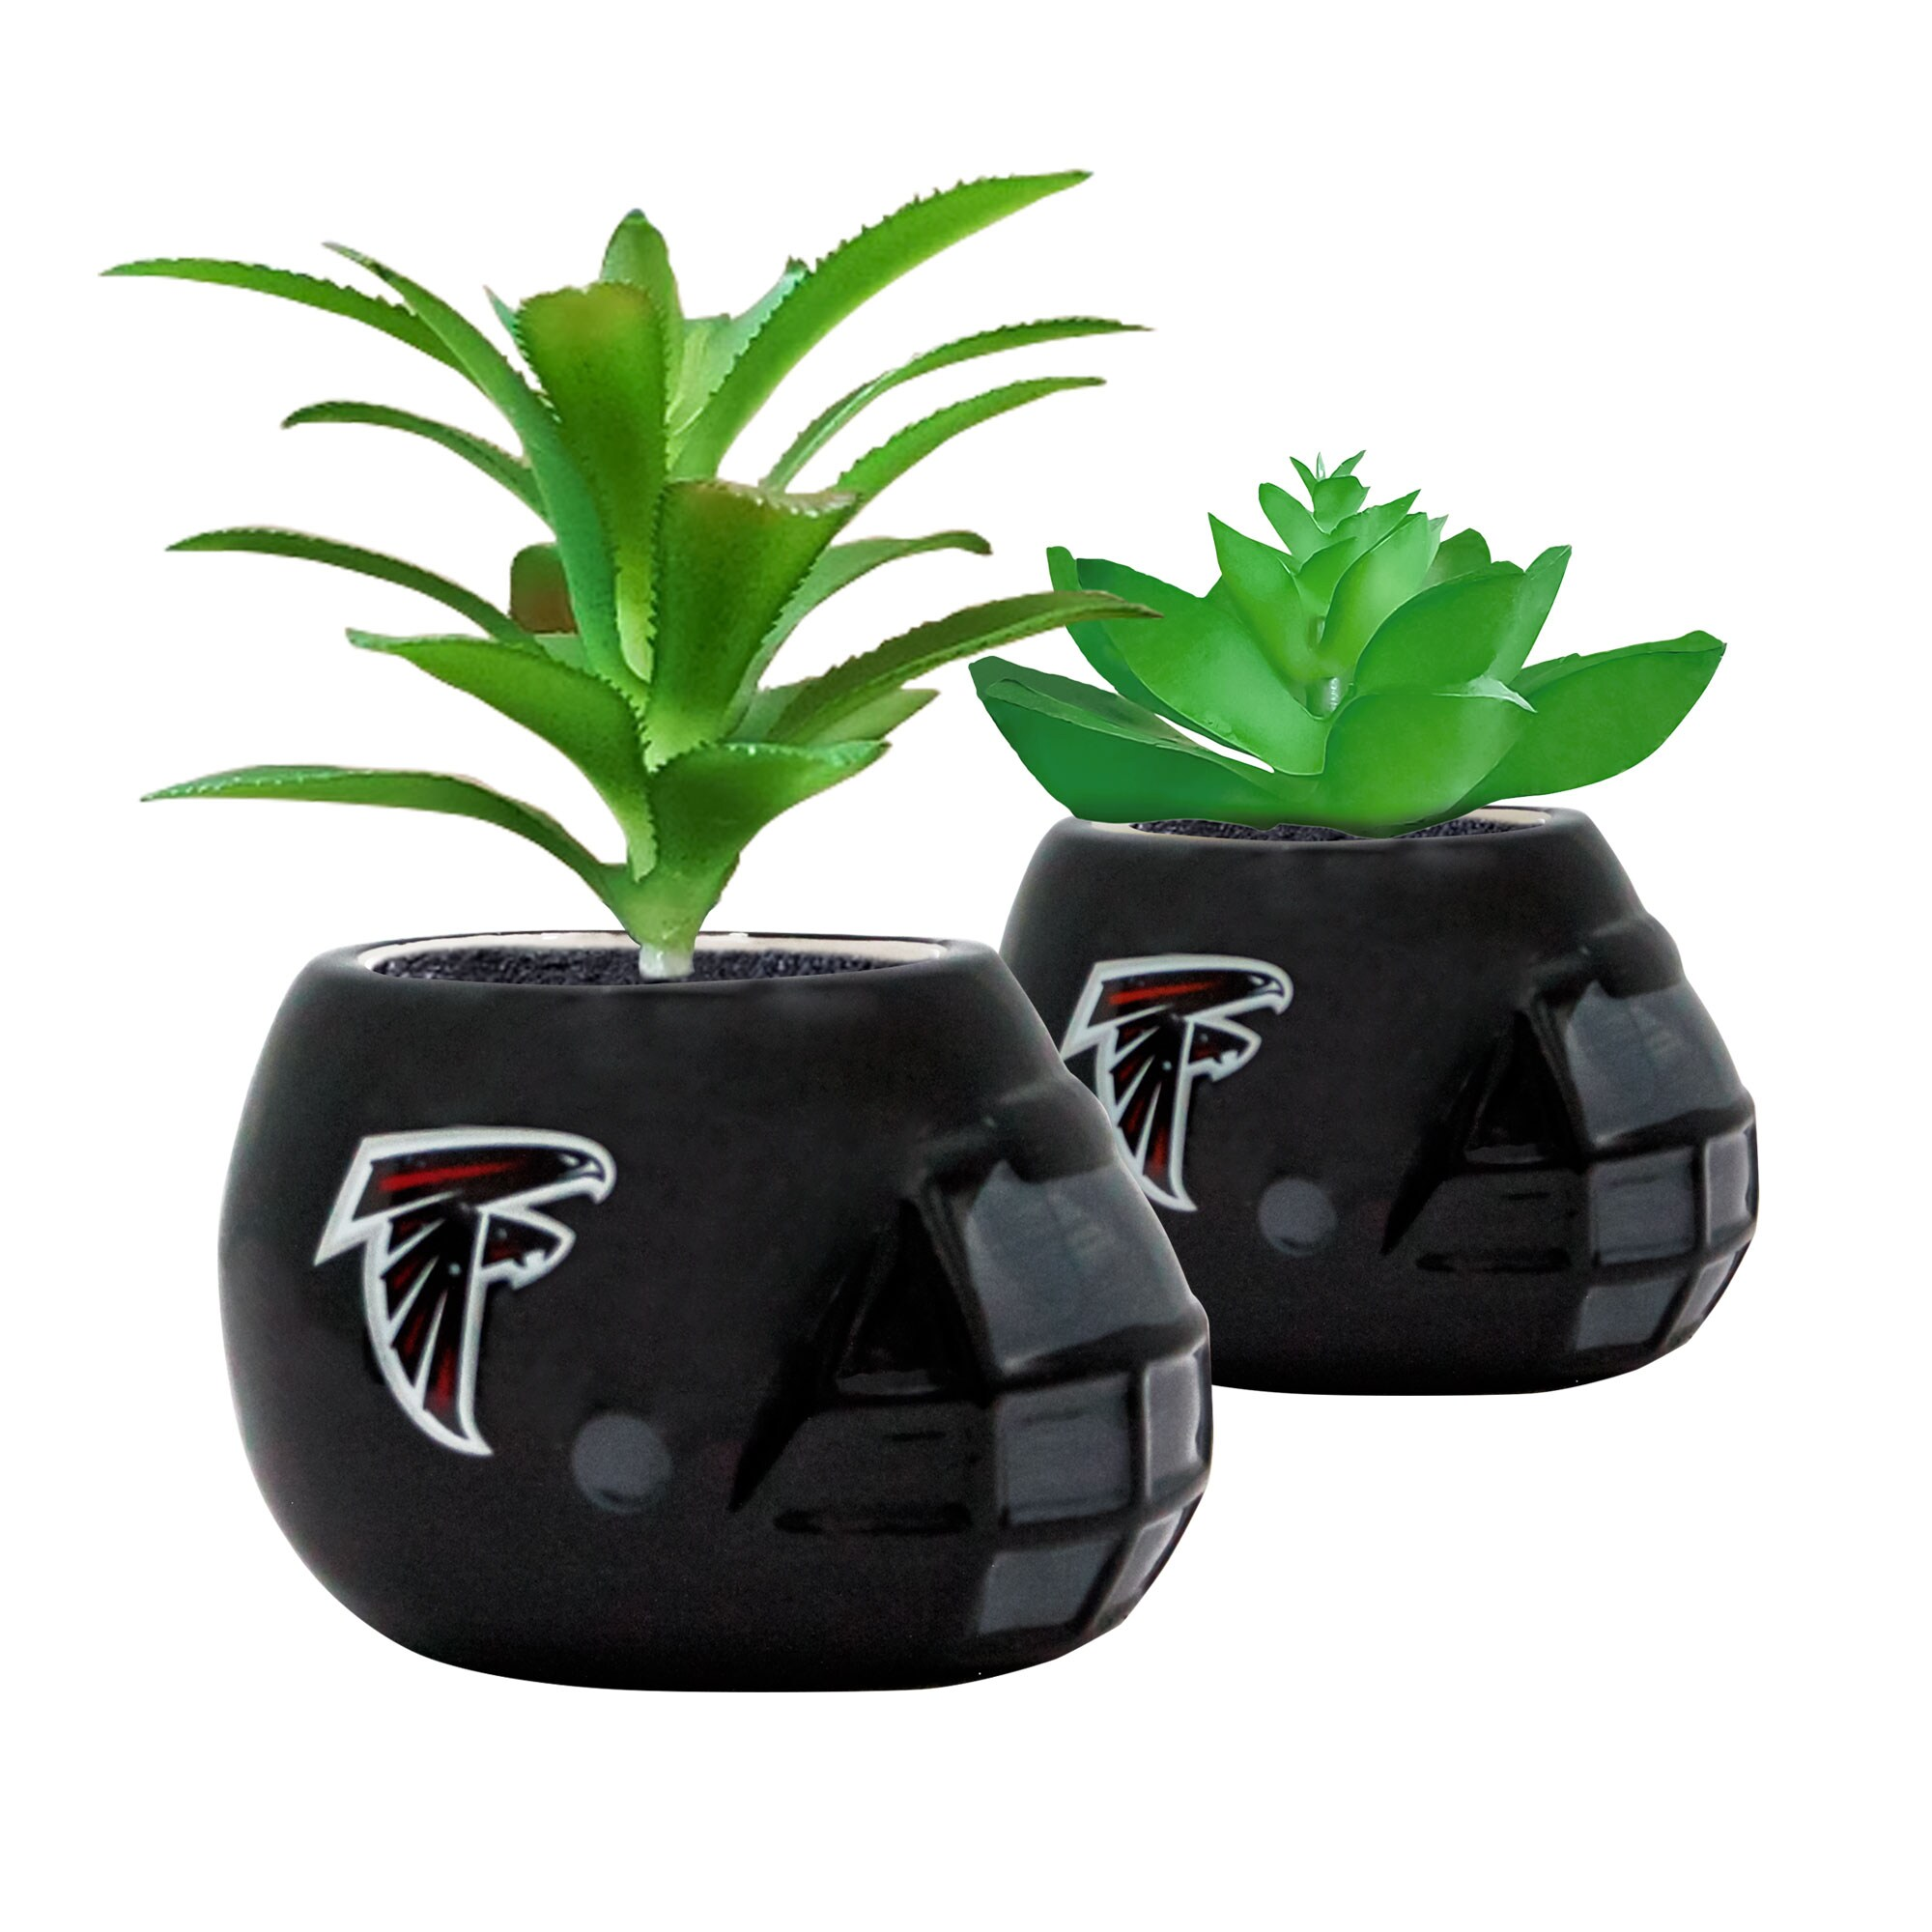 Atlanta Falcons 2-Piece Ceramic Helmet with Faux Succulent Set